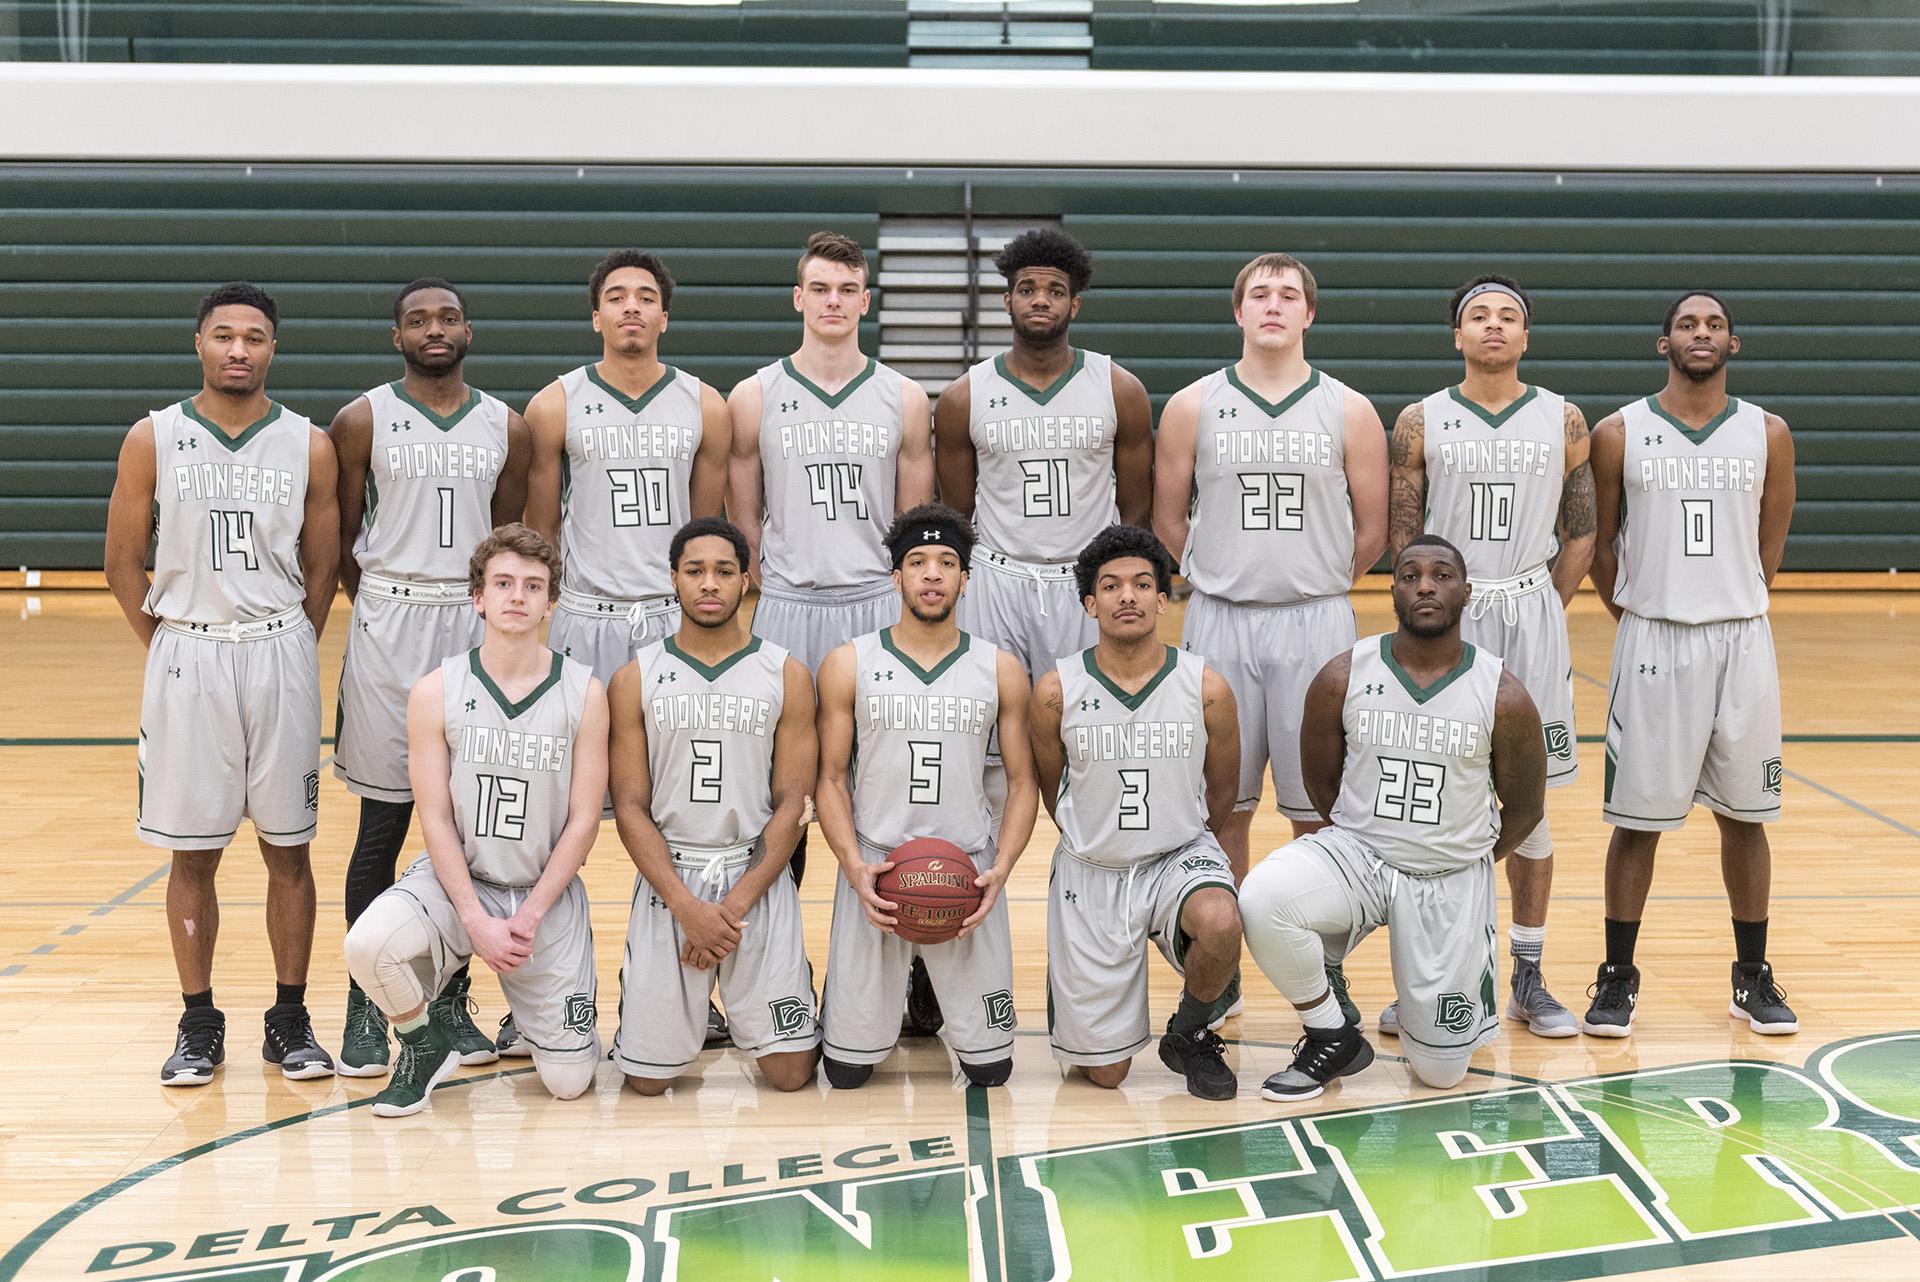 2018 Delta College mens basketball team